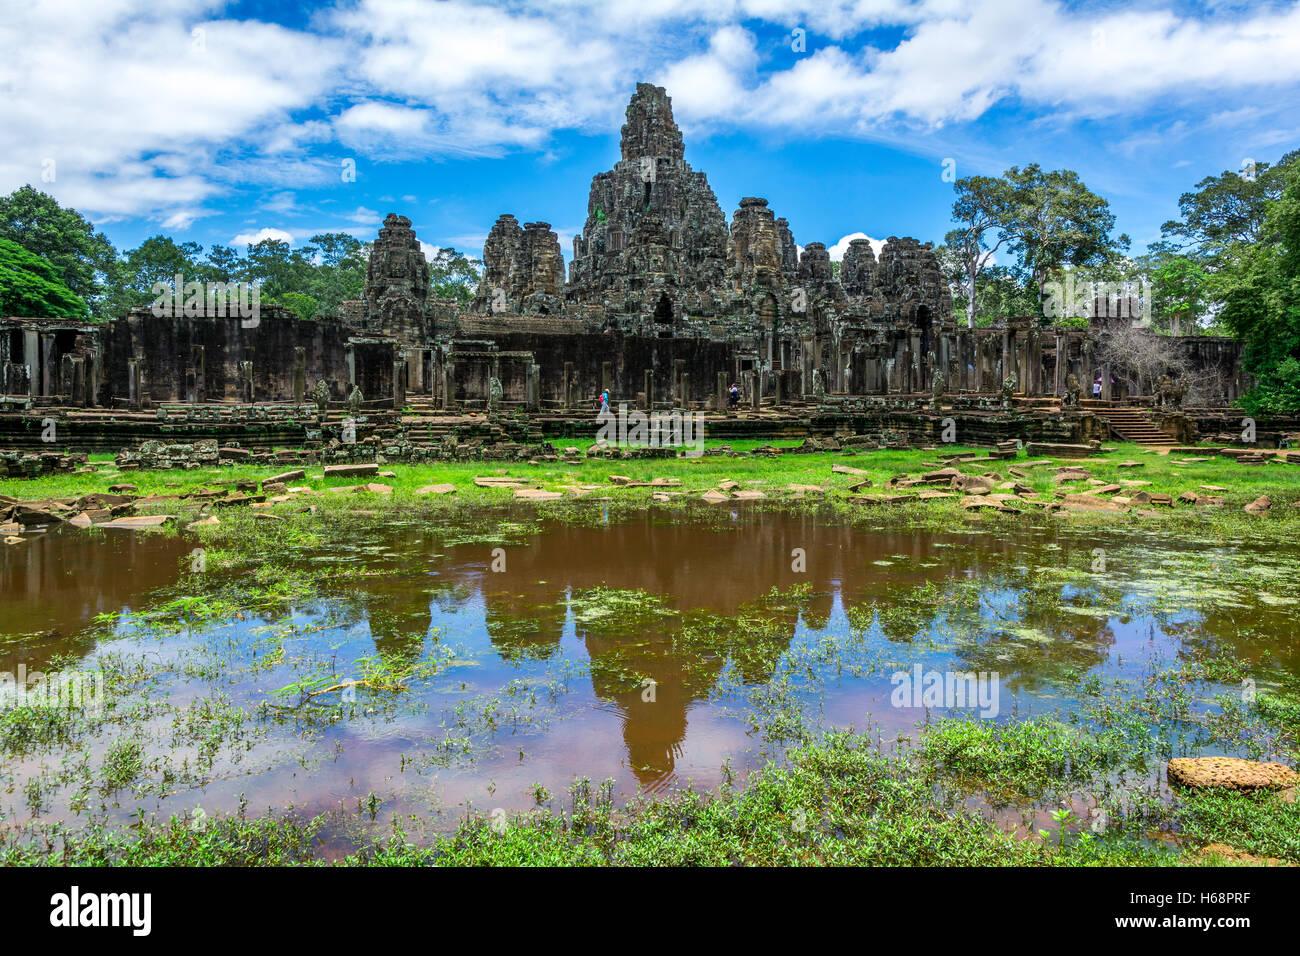 Angkor Wat Cambogia - Temple with Lake - Stock Image